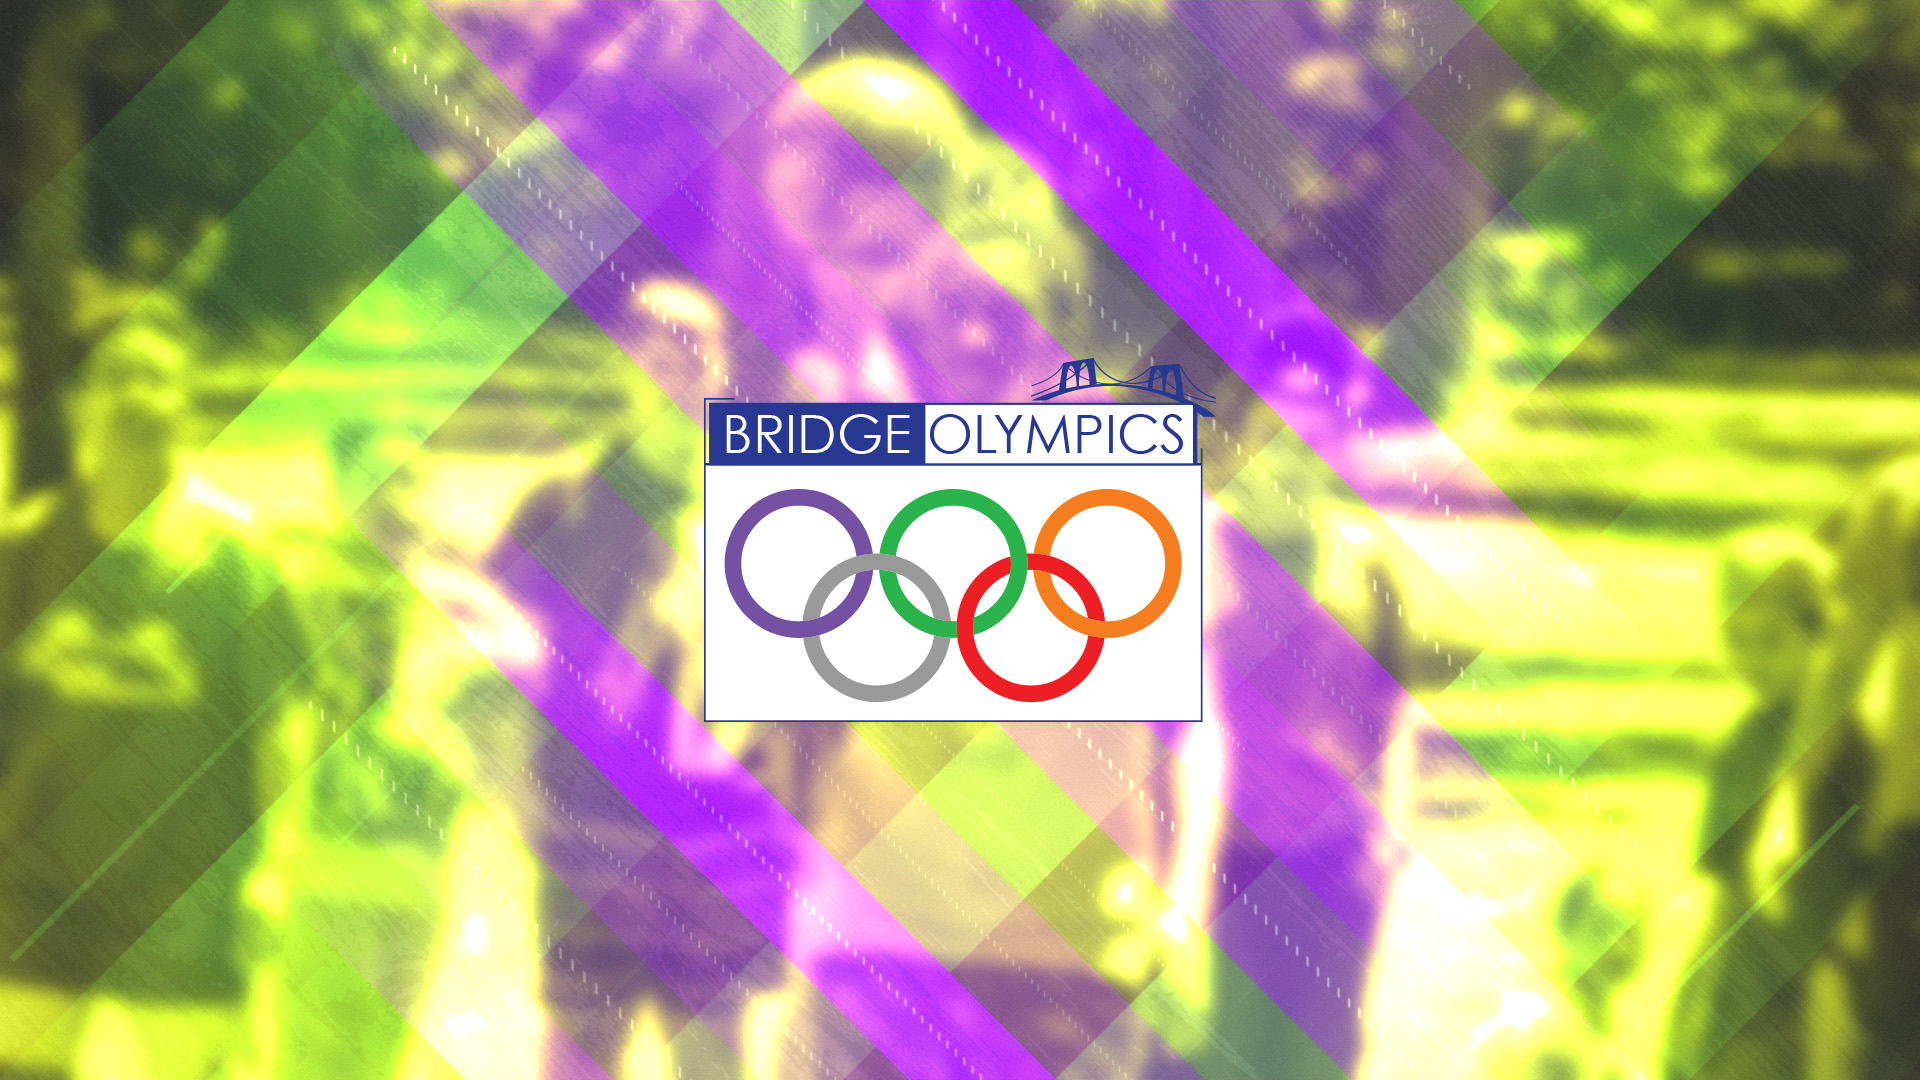 Bridge Olympics.jpg